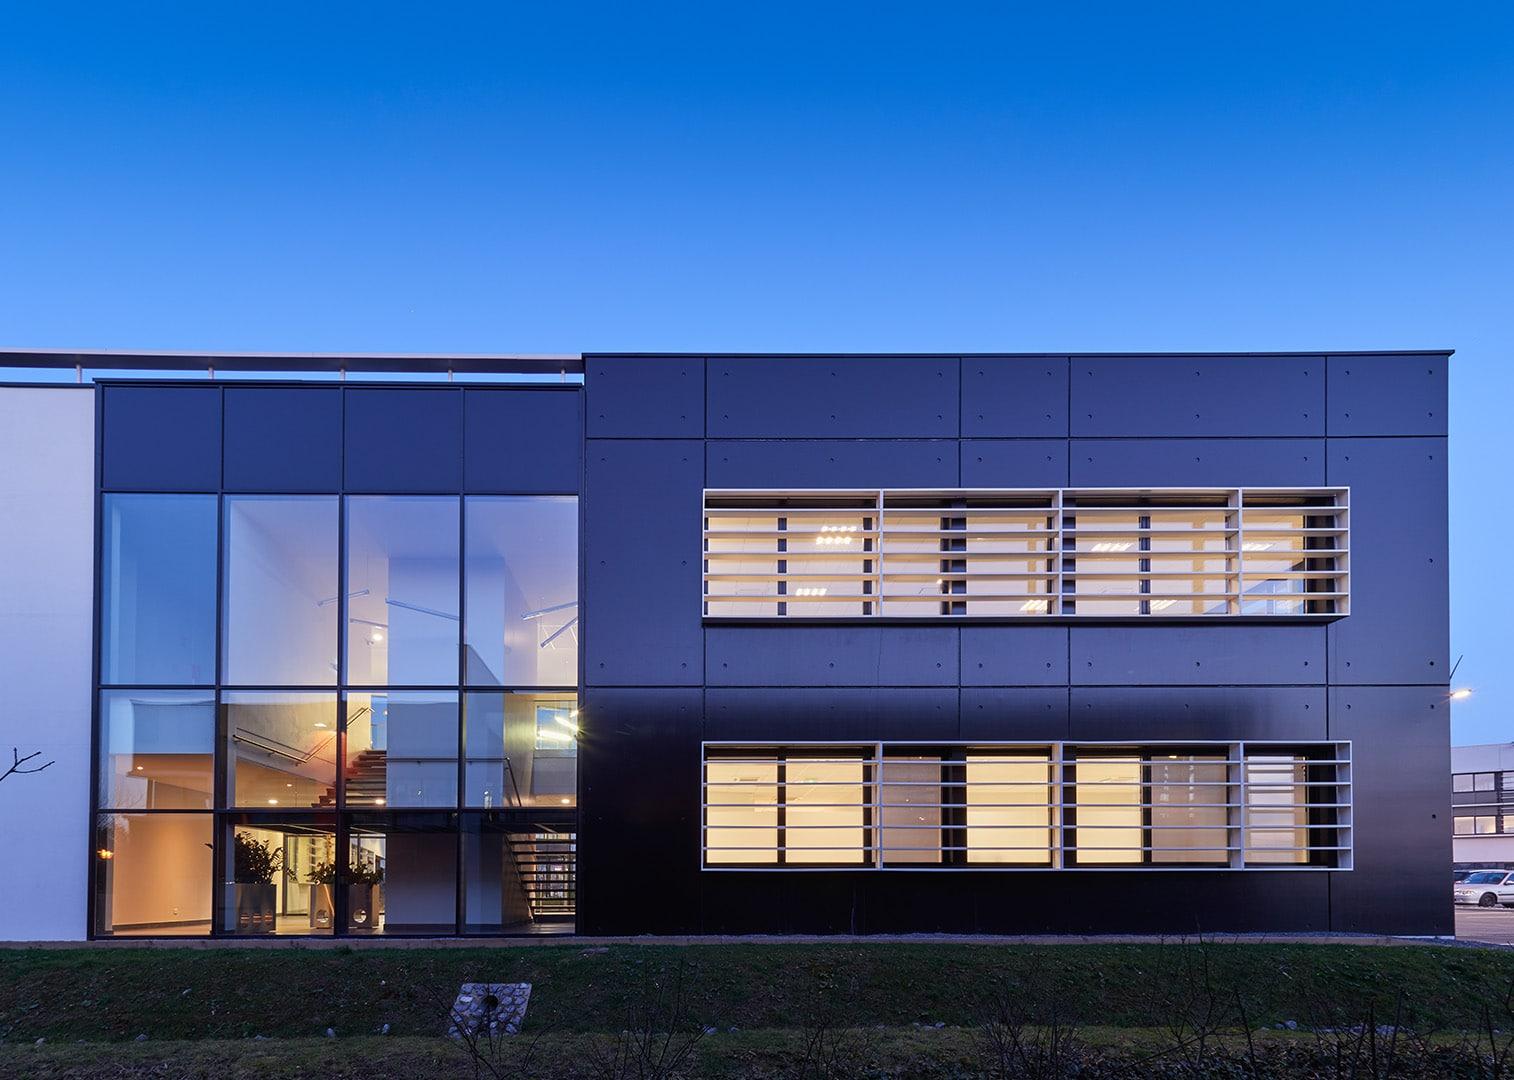 bureaux-isneauville-magellan-cba-rouen-4